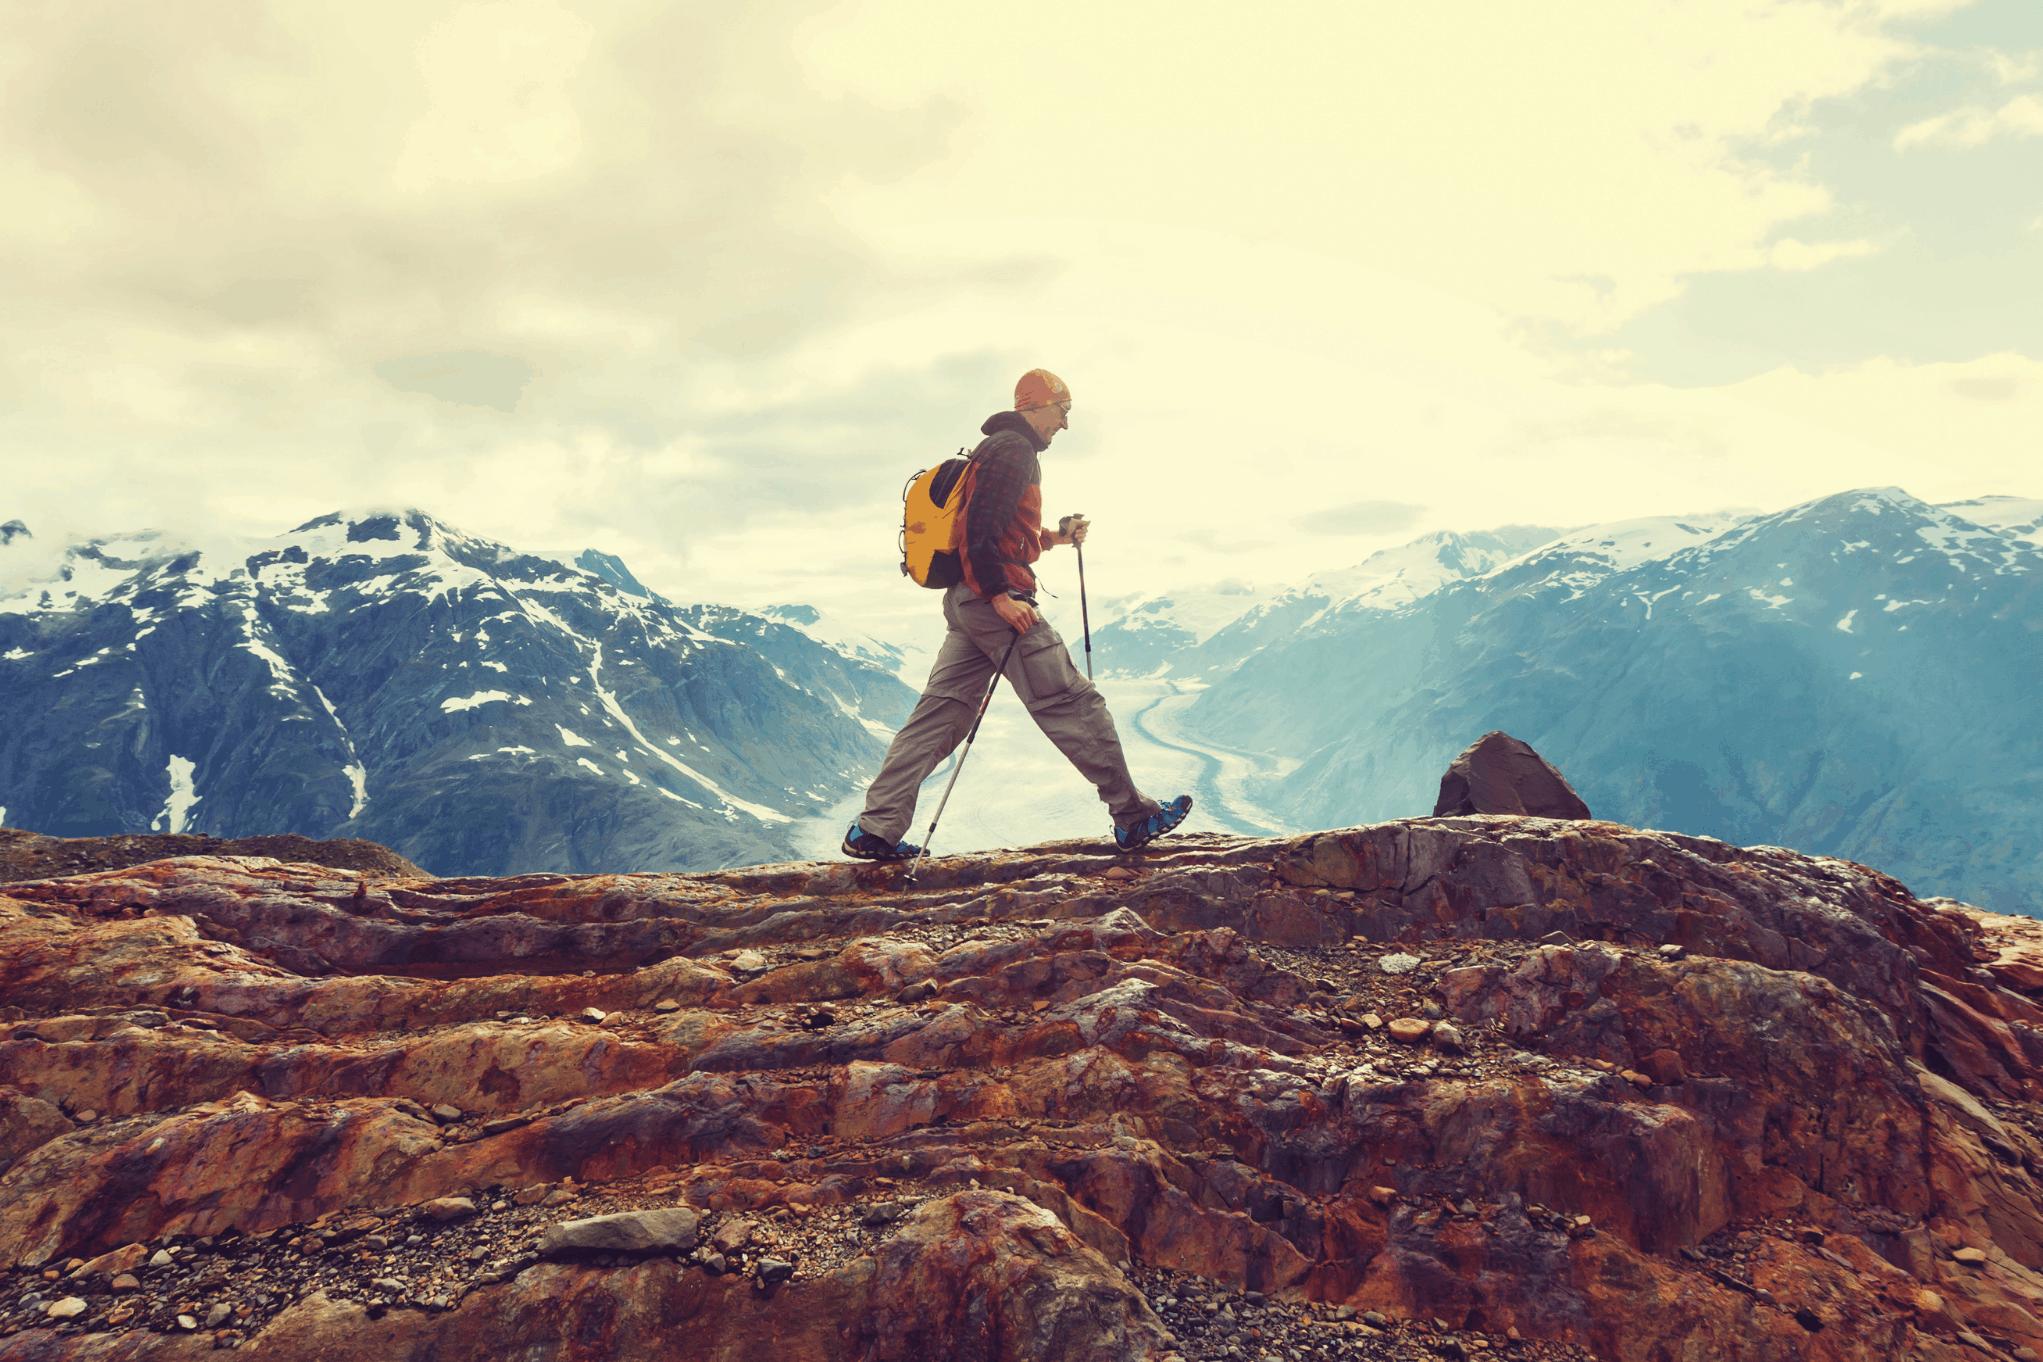 men's hiking shoes